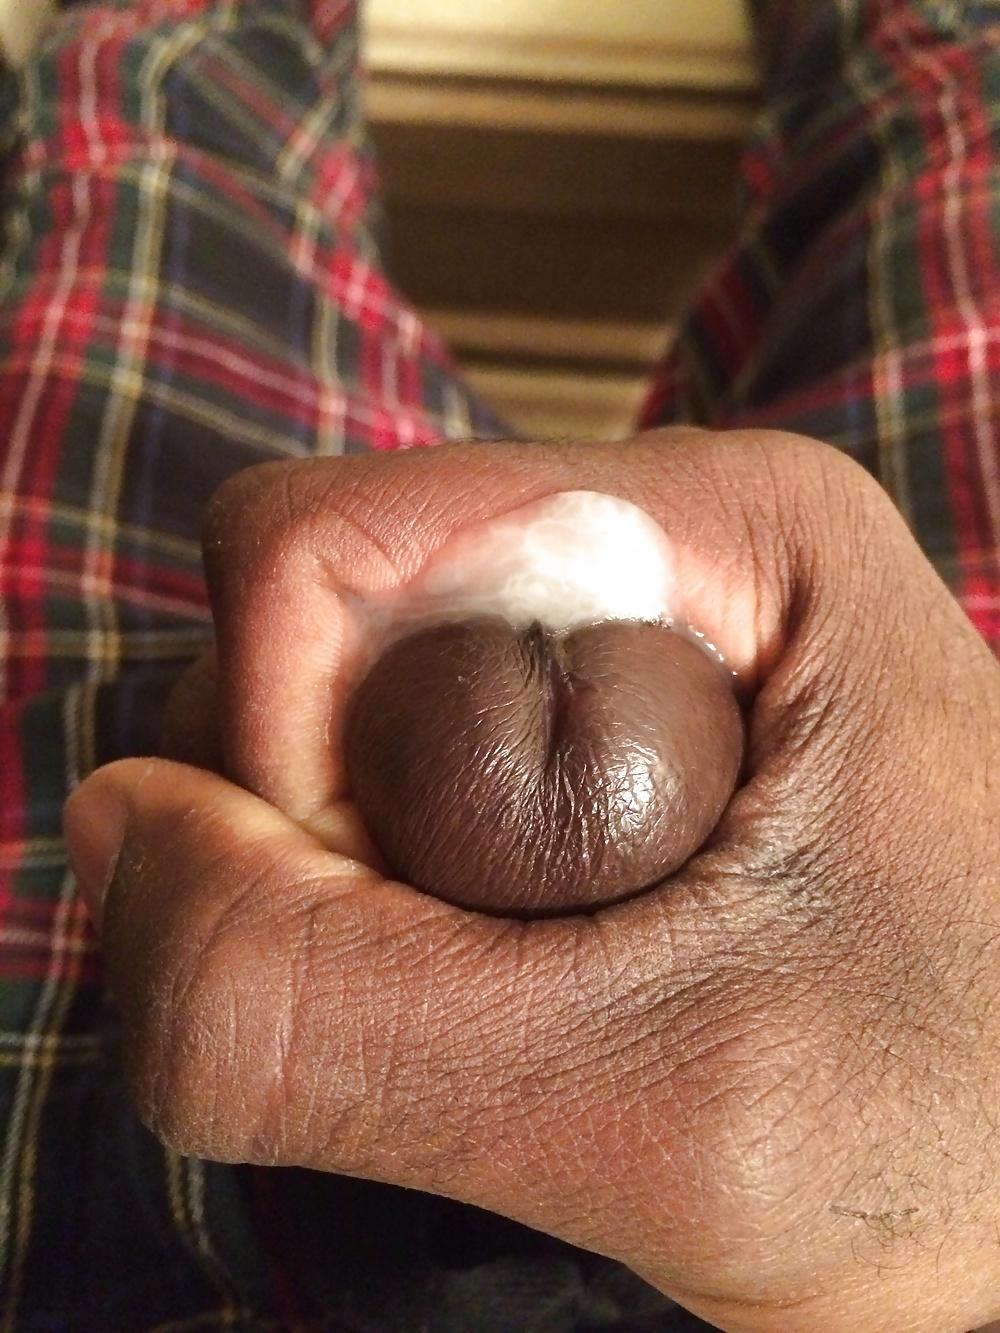 Wet dick pictures